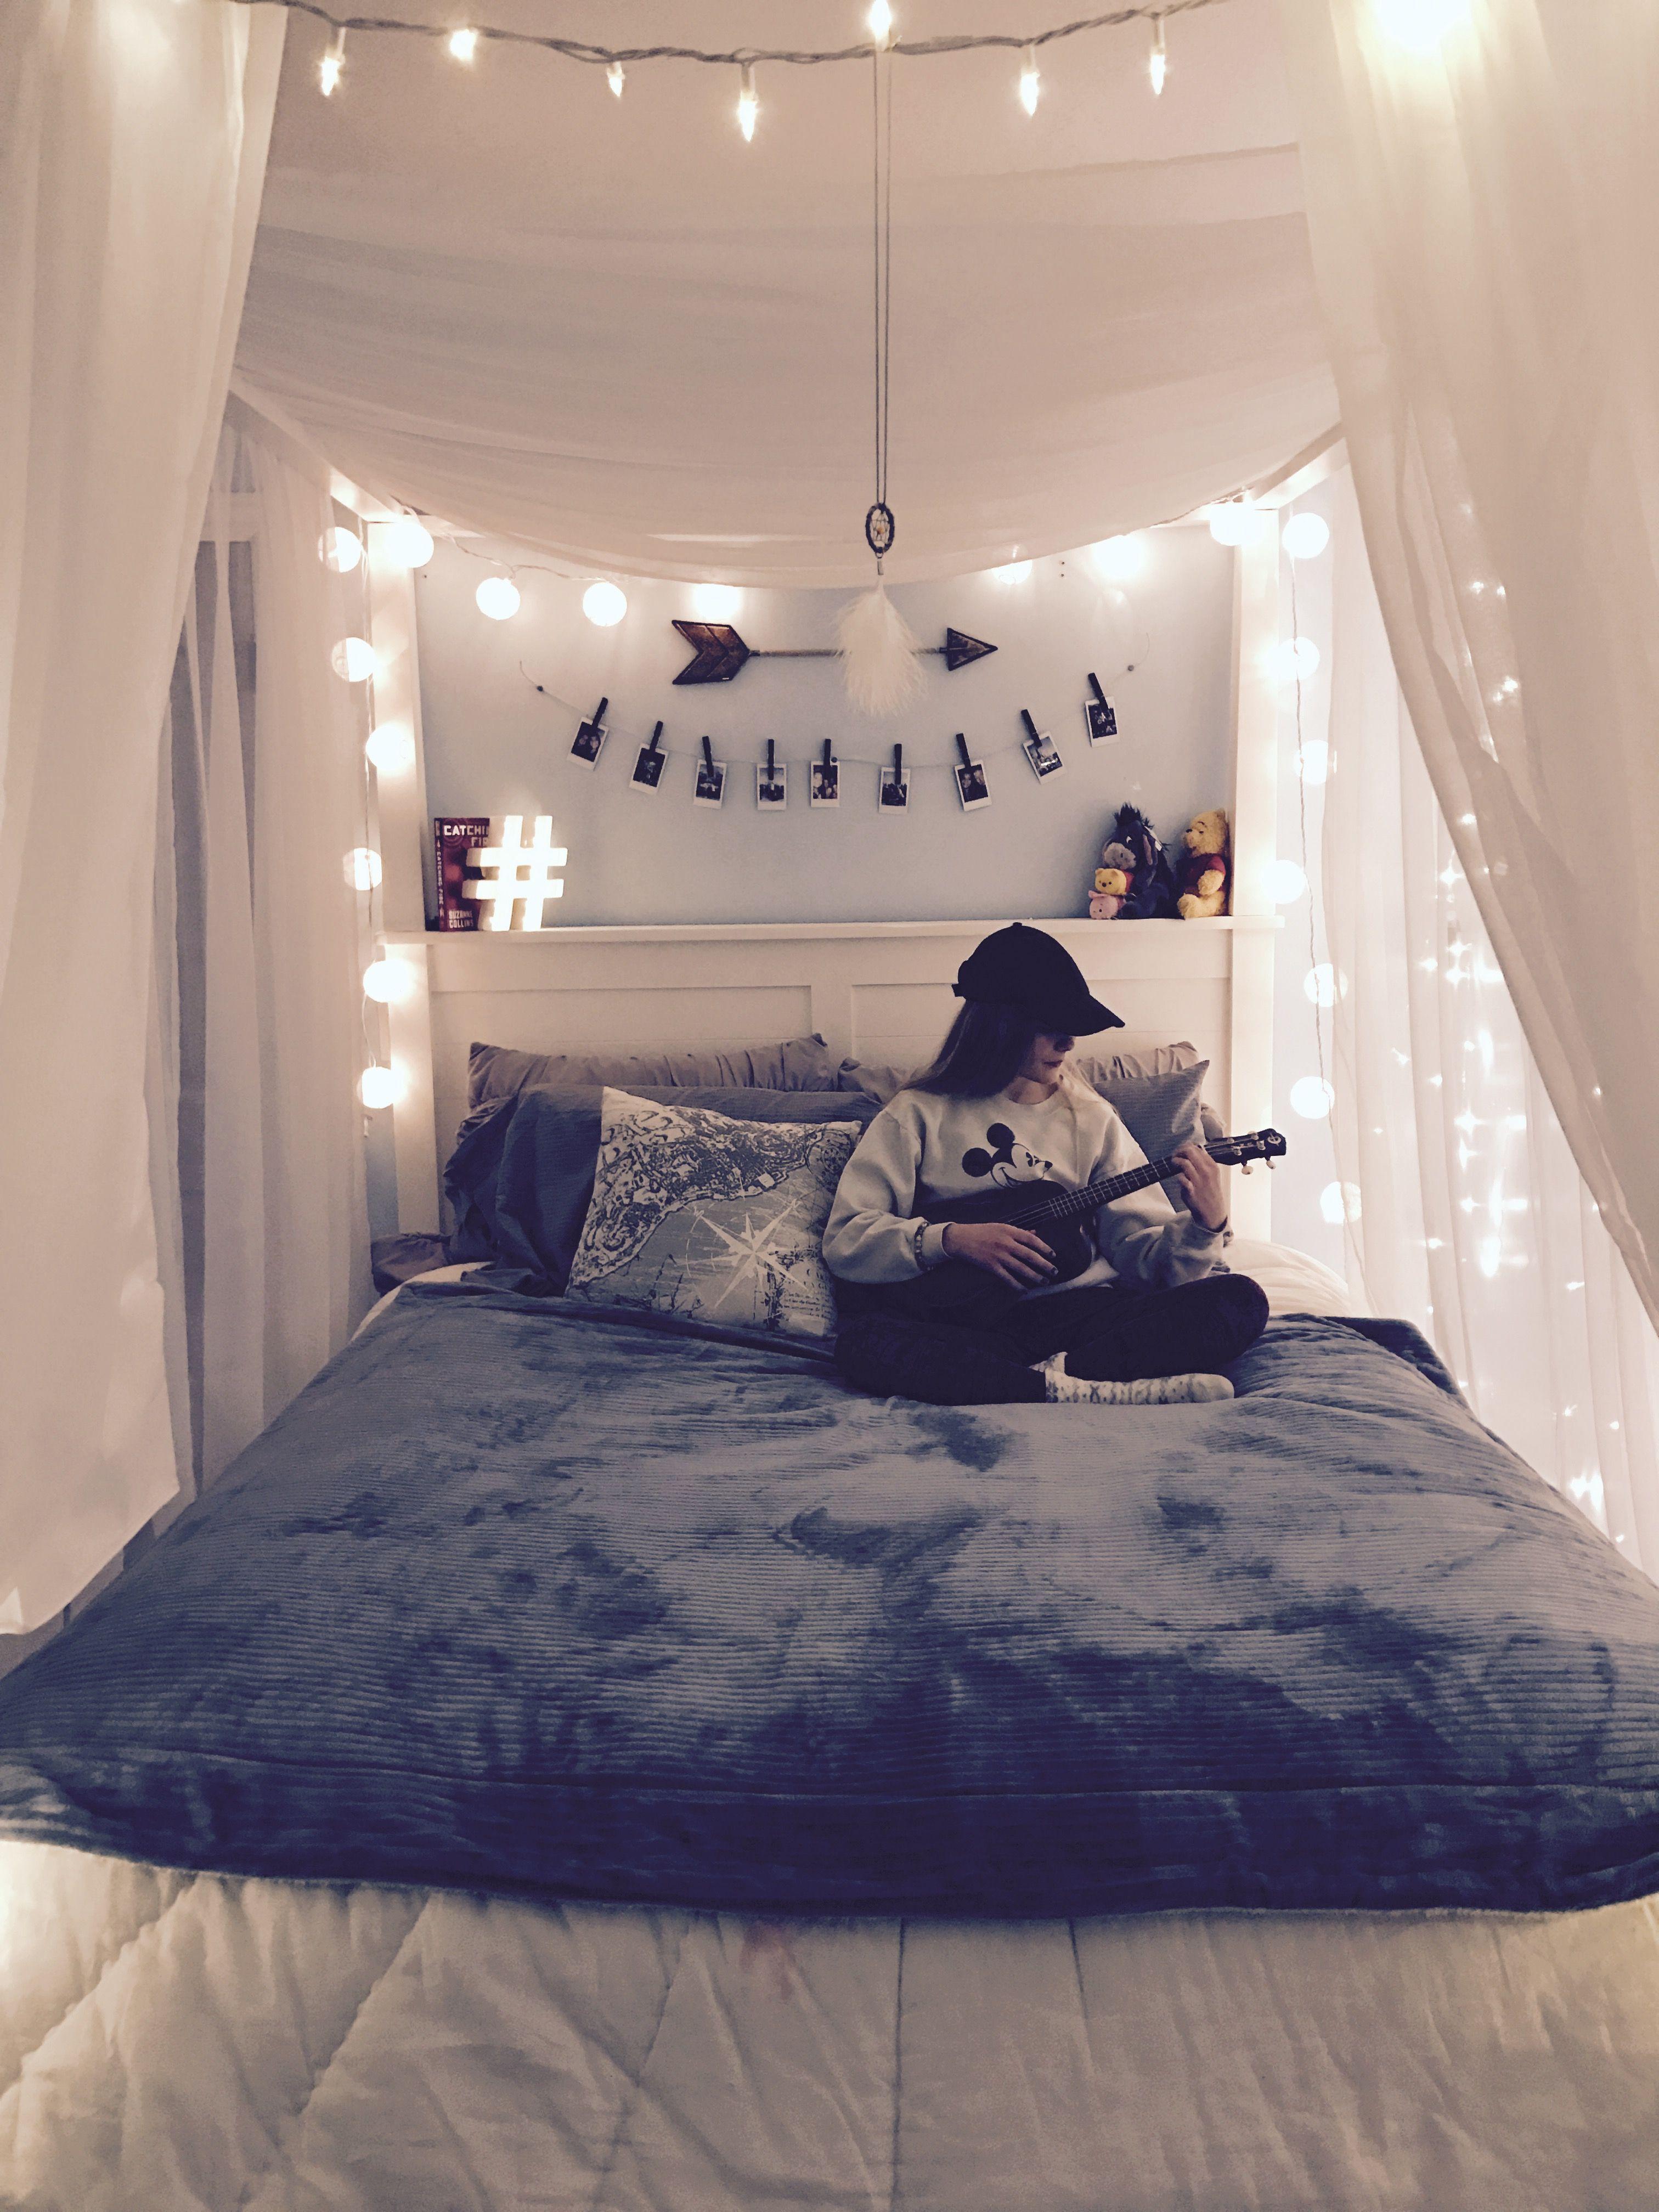 teenage girl bedroom ideas teen girl bedroom makeover ideas | diy room decor for teenagers RSFMWPB